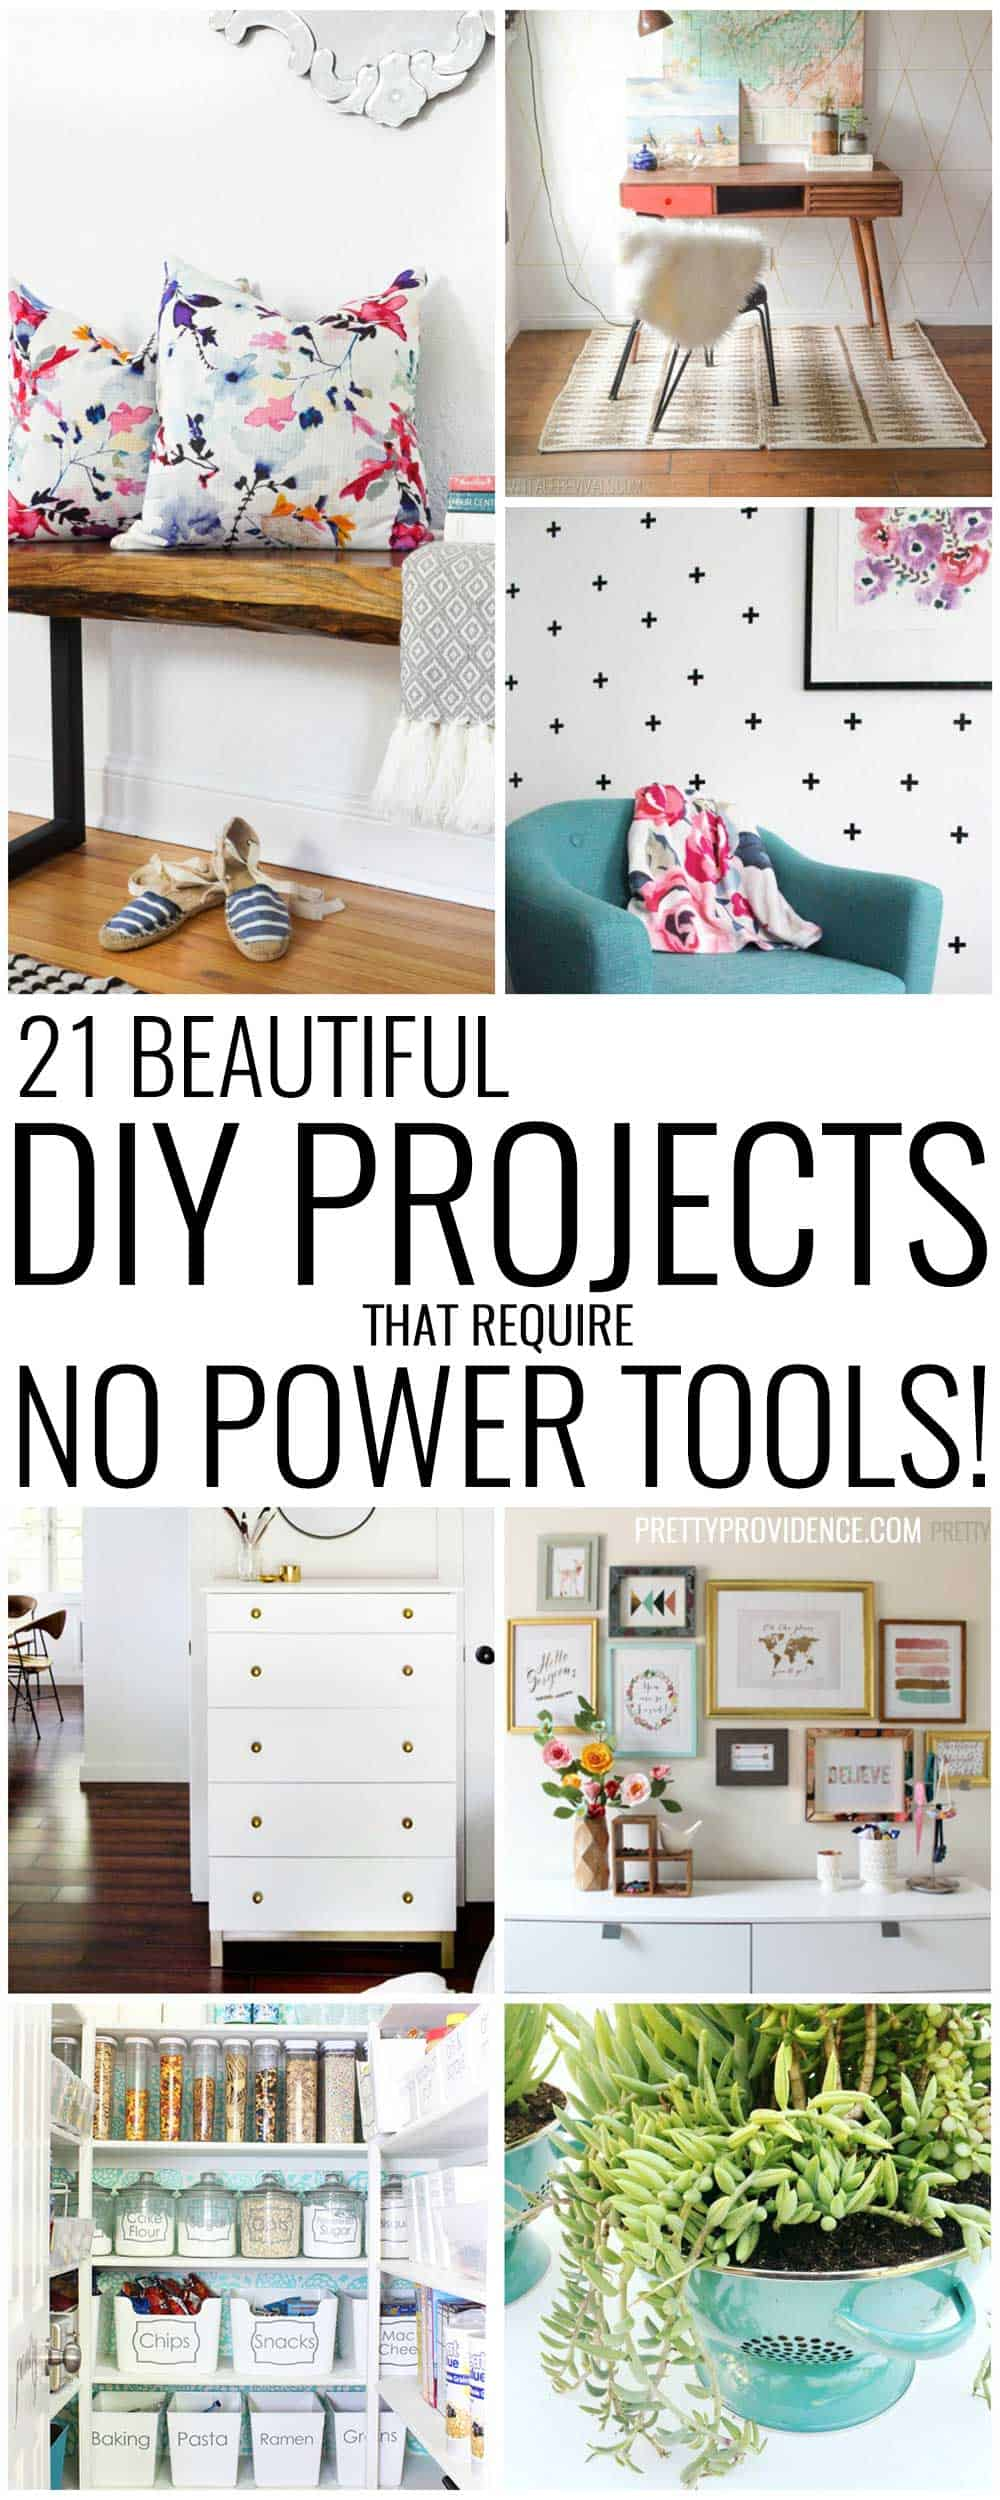 diy-projects-no-power-tools-pin